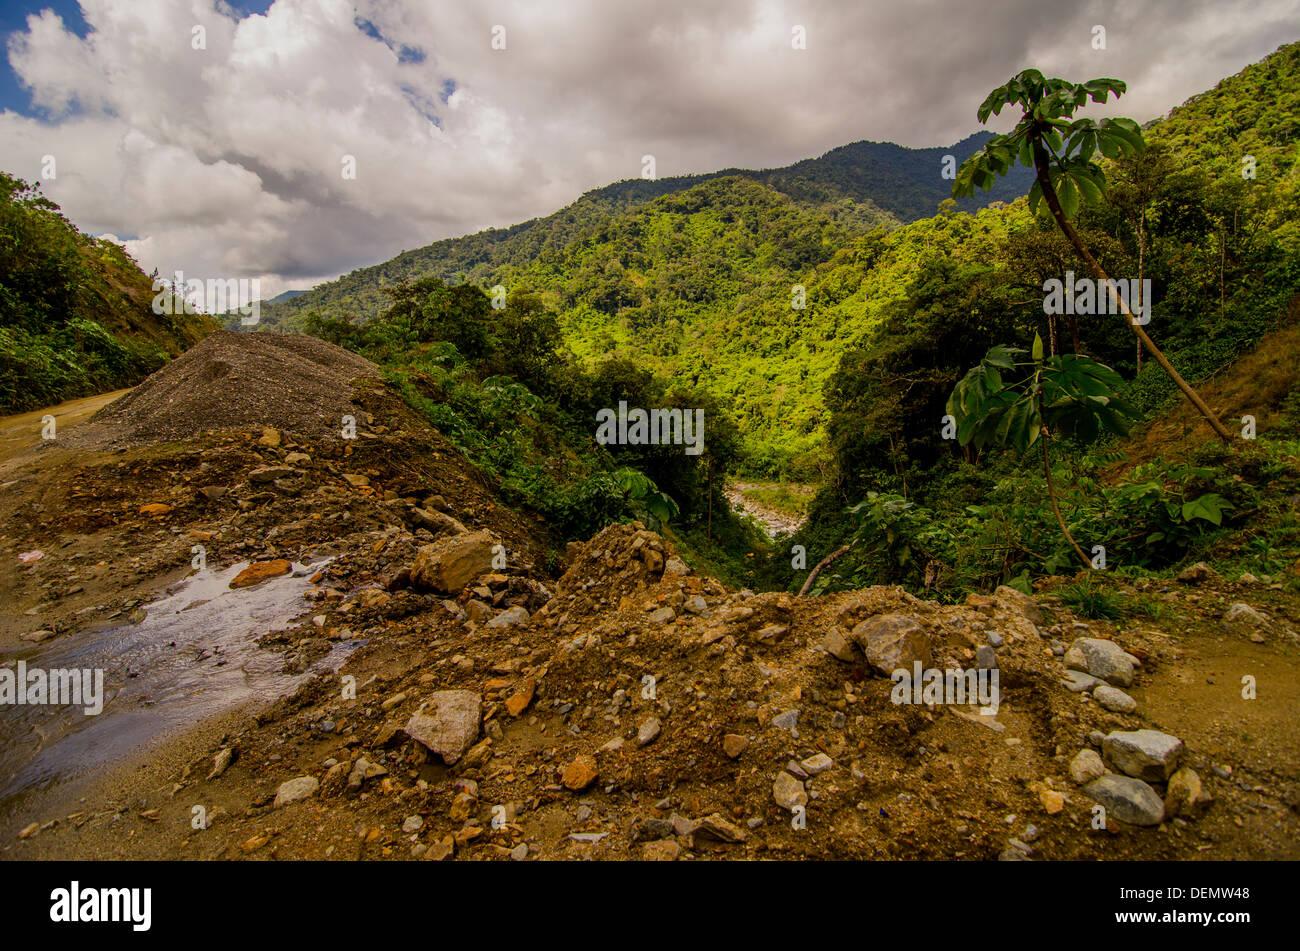 Manu Road through Manu National Park Madre de Dios - from Cuzco to the Madre de Dios River and Manu - Stock Image